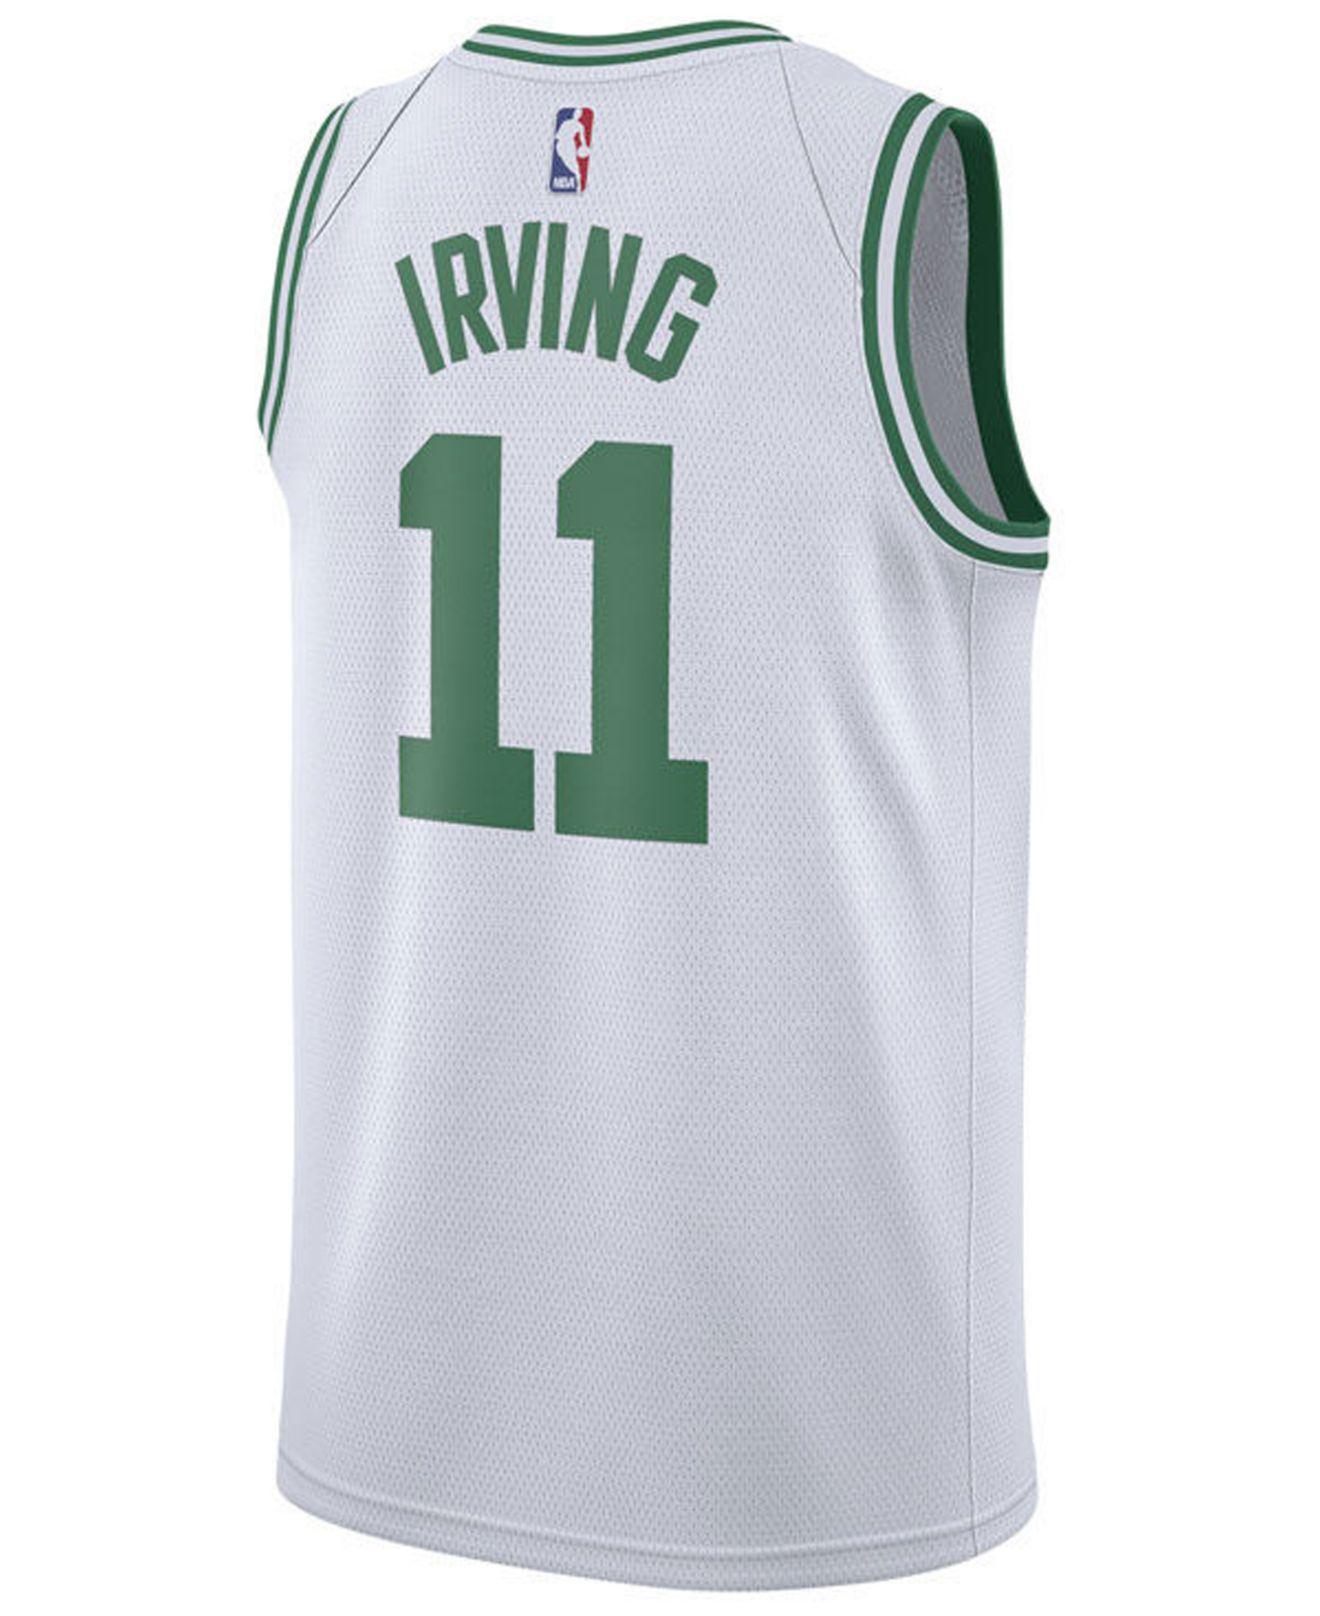 Nike. Men s White Kyrie Irving Association Edition Swingman (boston Celtics)  Nba Connected Jersey cc260430a